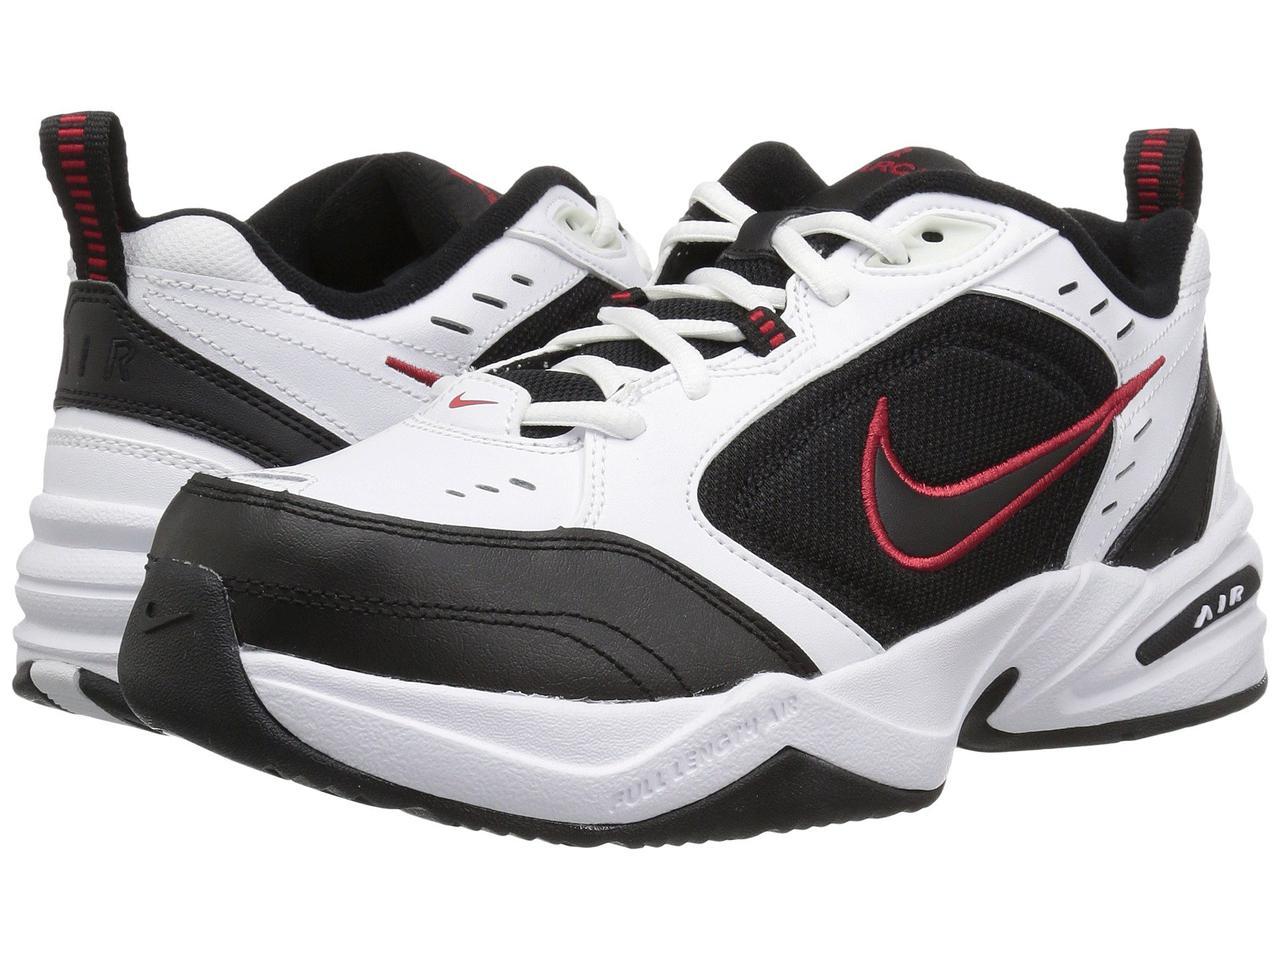 1d03c599 Кроссовки/Кеды (Оригинал) Nike Air Monarch IV White/Black-Varsity Red